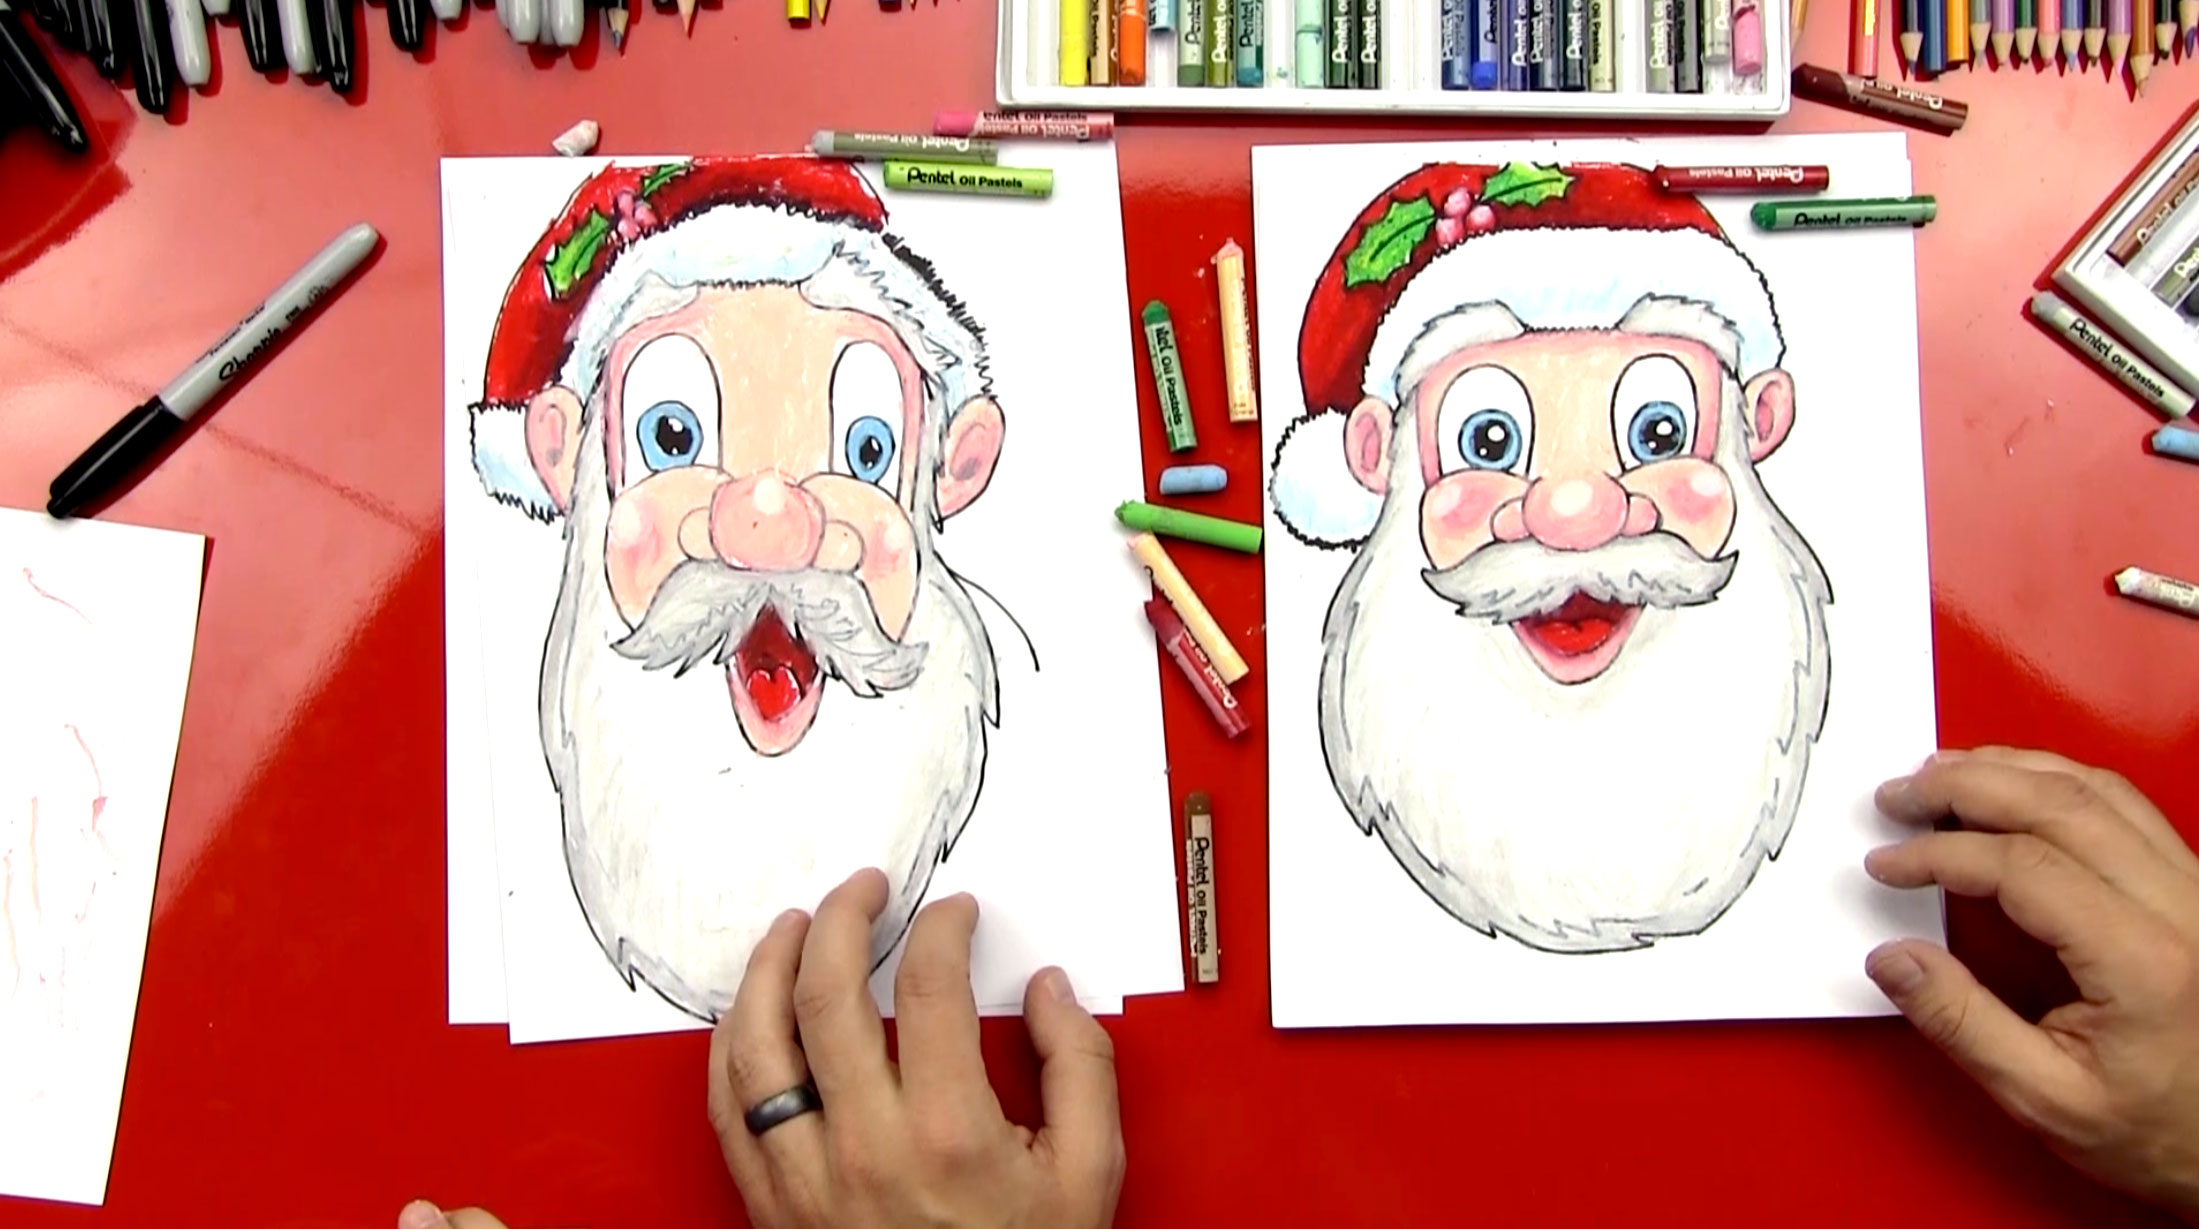 Drawn santa for kid santa How To Face Kids Claus's